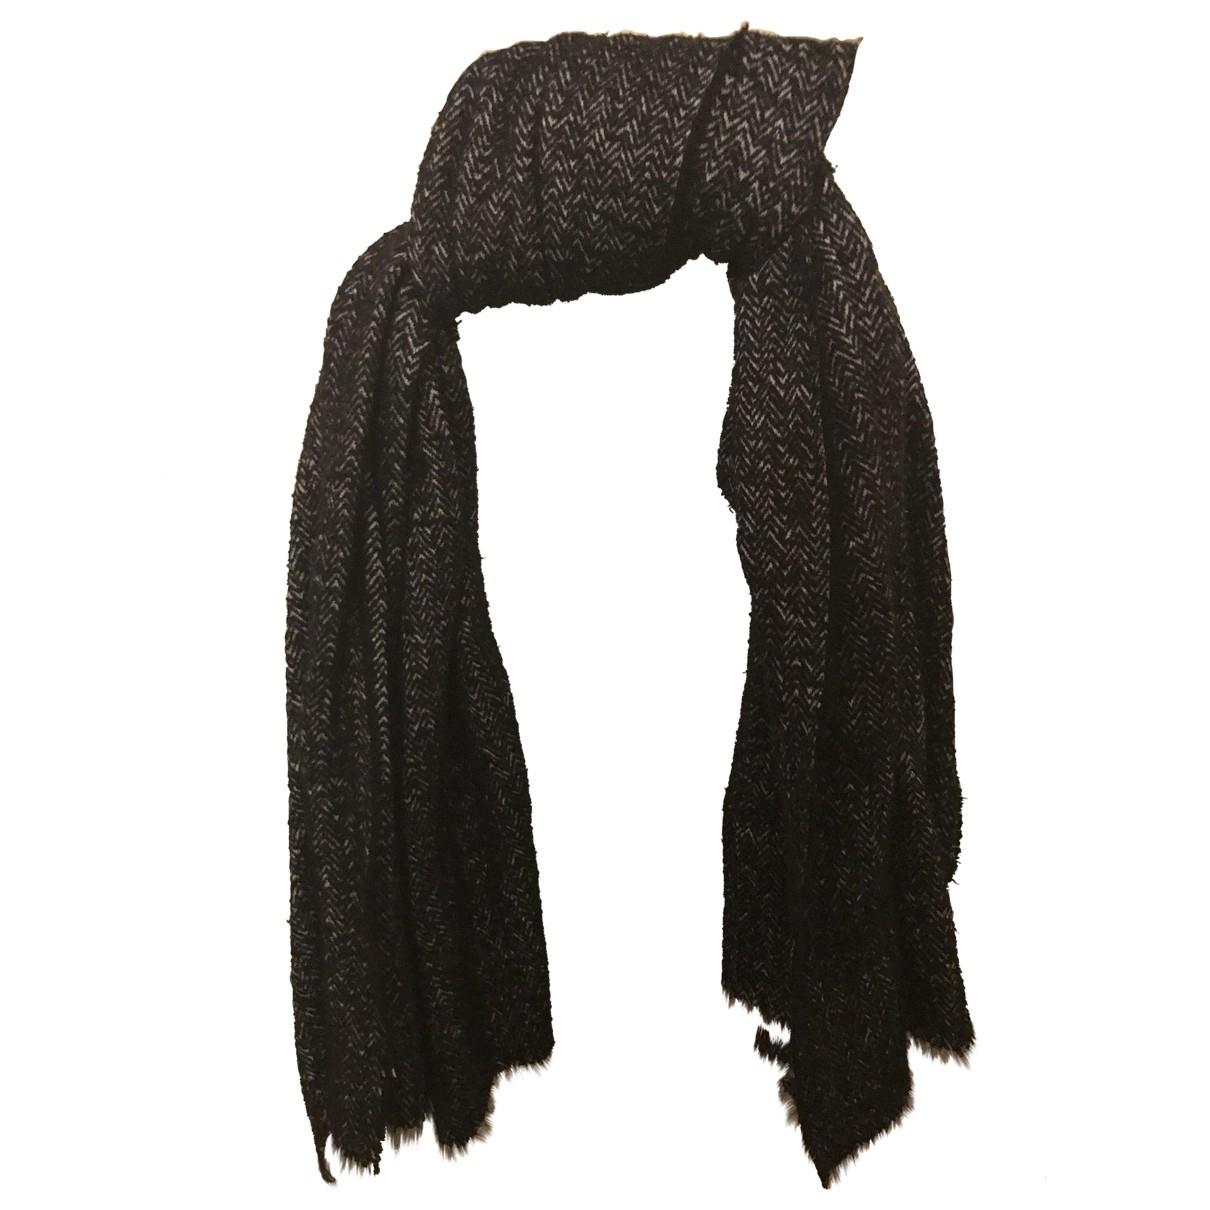 Zara \N Black Cotton scarf for Women \N